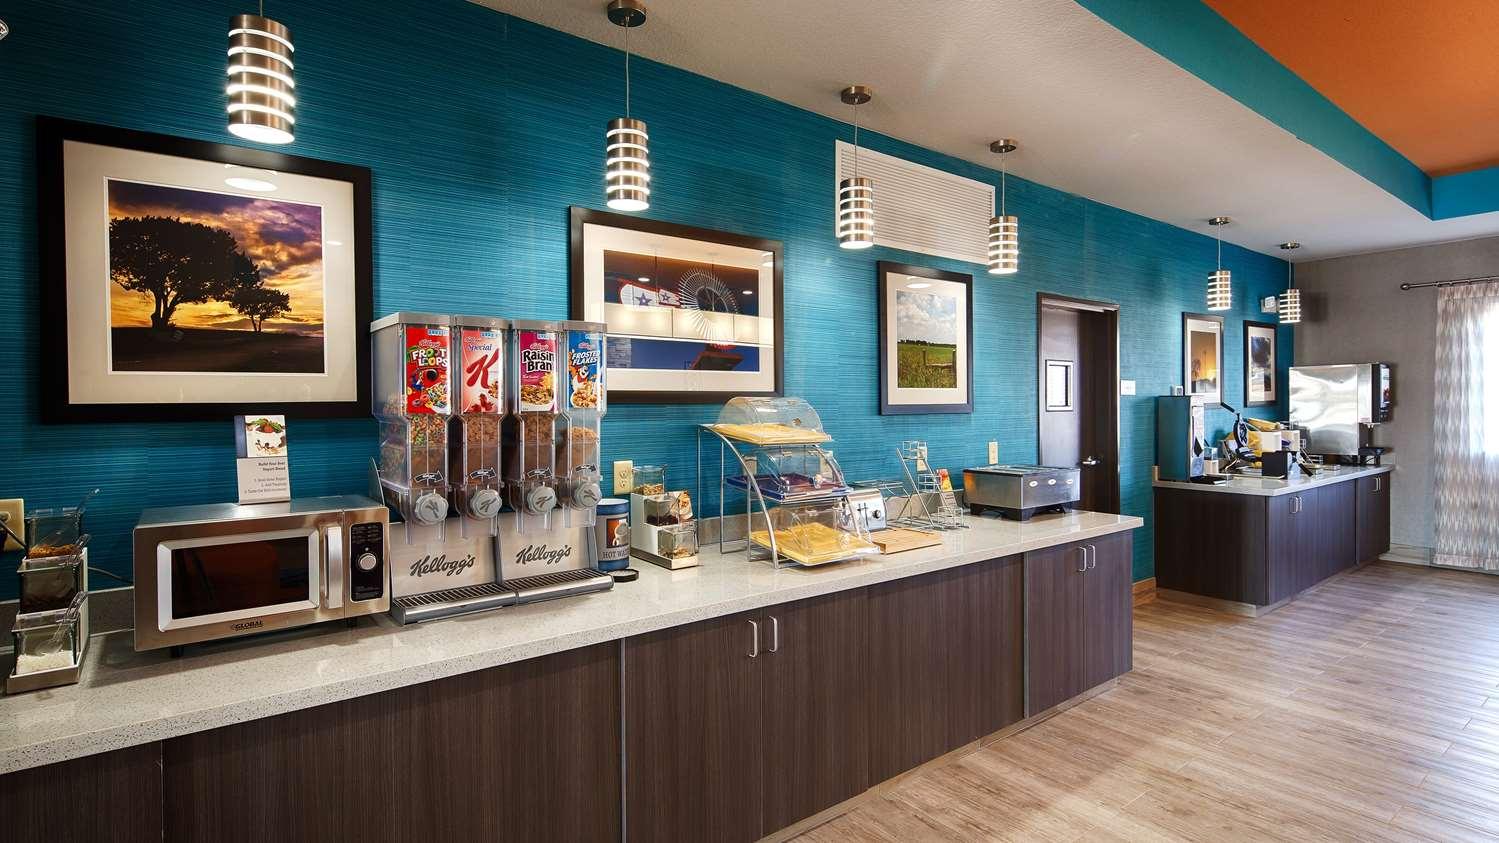 Restaurant - Best Western Plus Lonestar Inn & Suites Colorado City